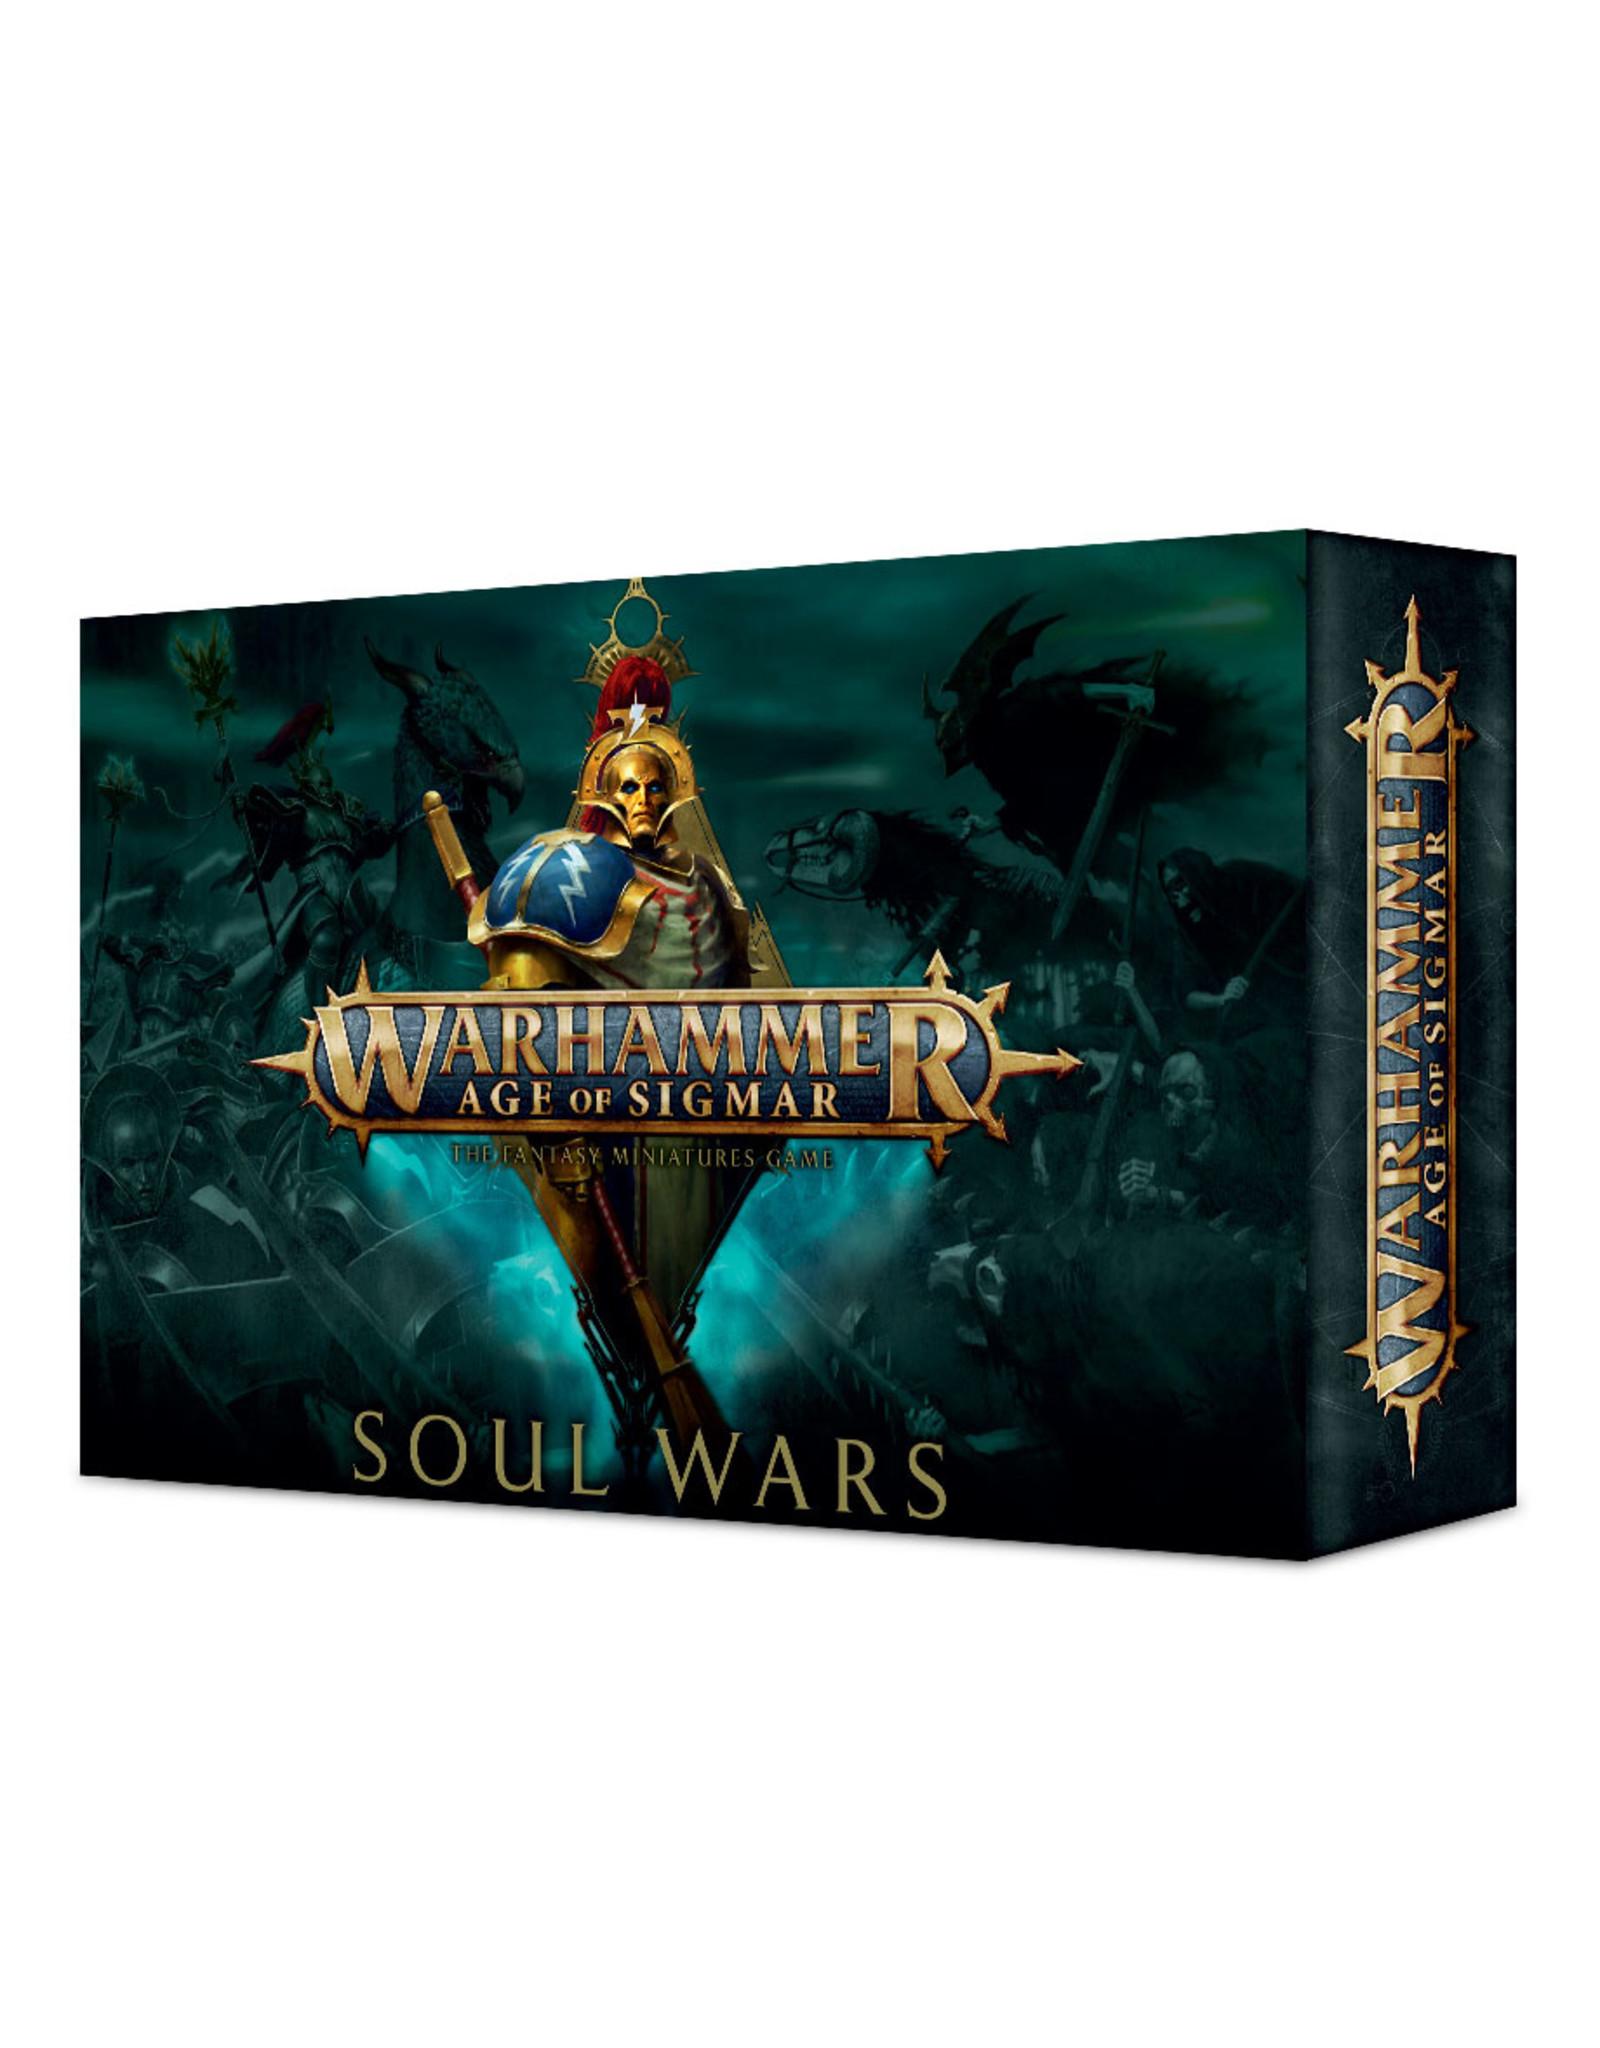 Age of Sigmar Age of Sigmar: Soul Wars